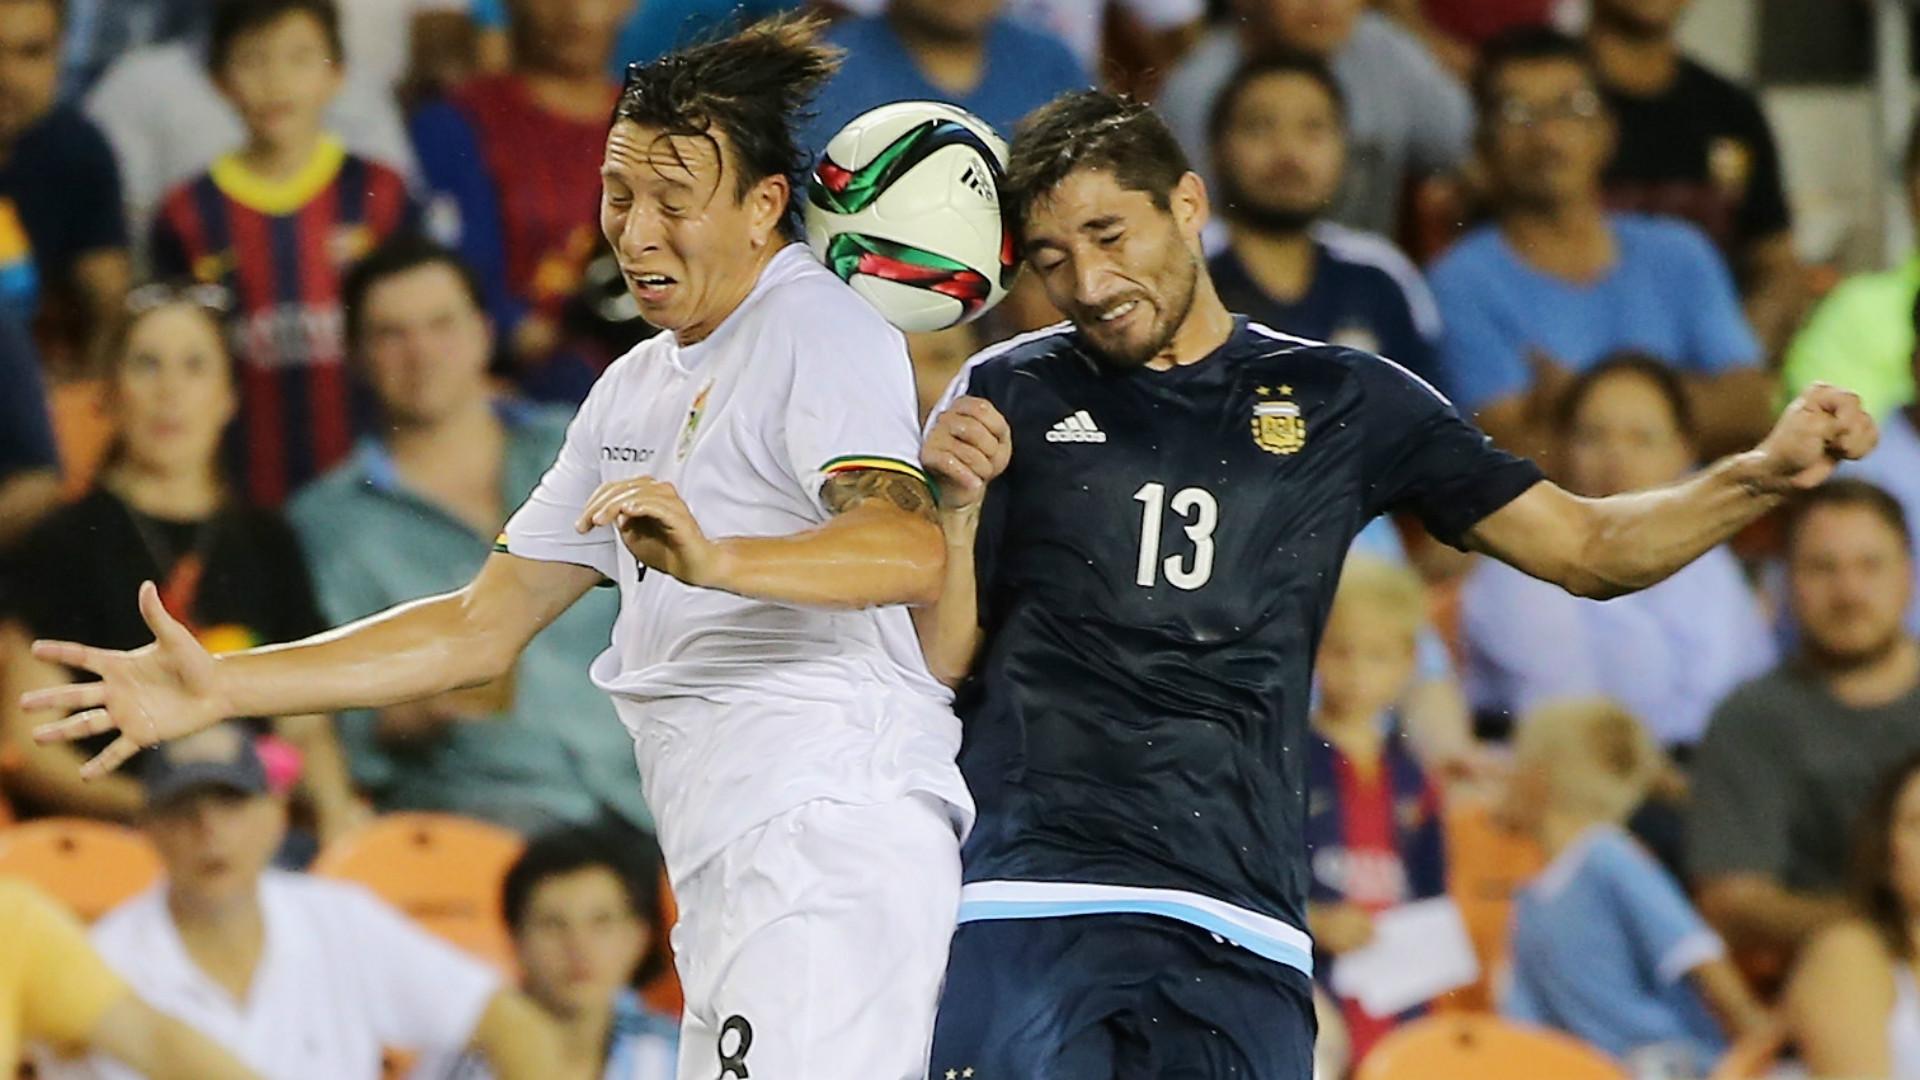 Milton Casco Argentina Bolivia Friendly Match 04092015